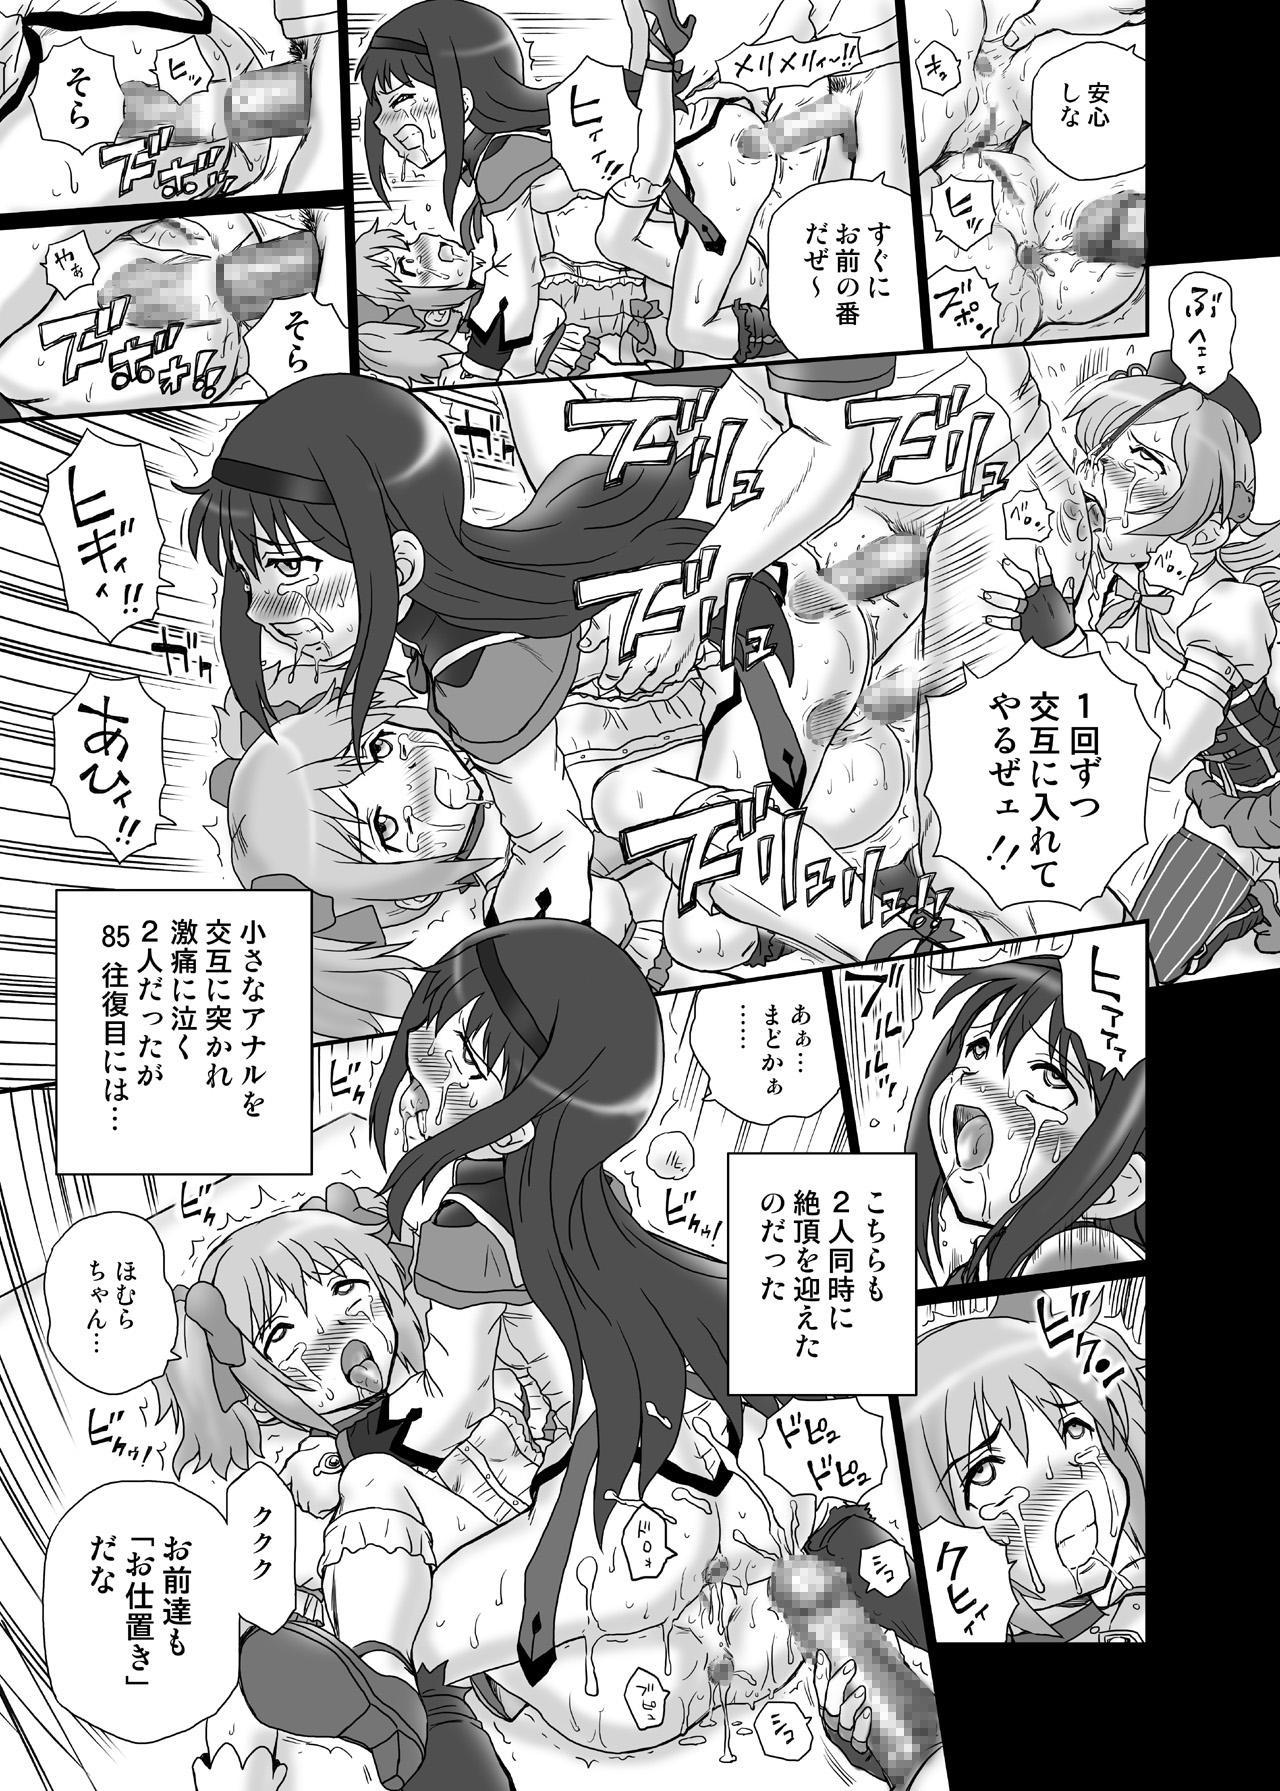 """Mado★Magi"" Anal & Scatolo Sakuhinshuu 25"